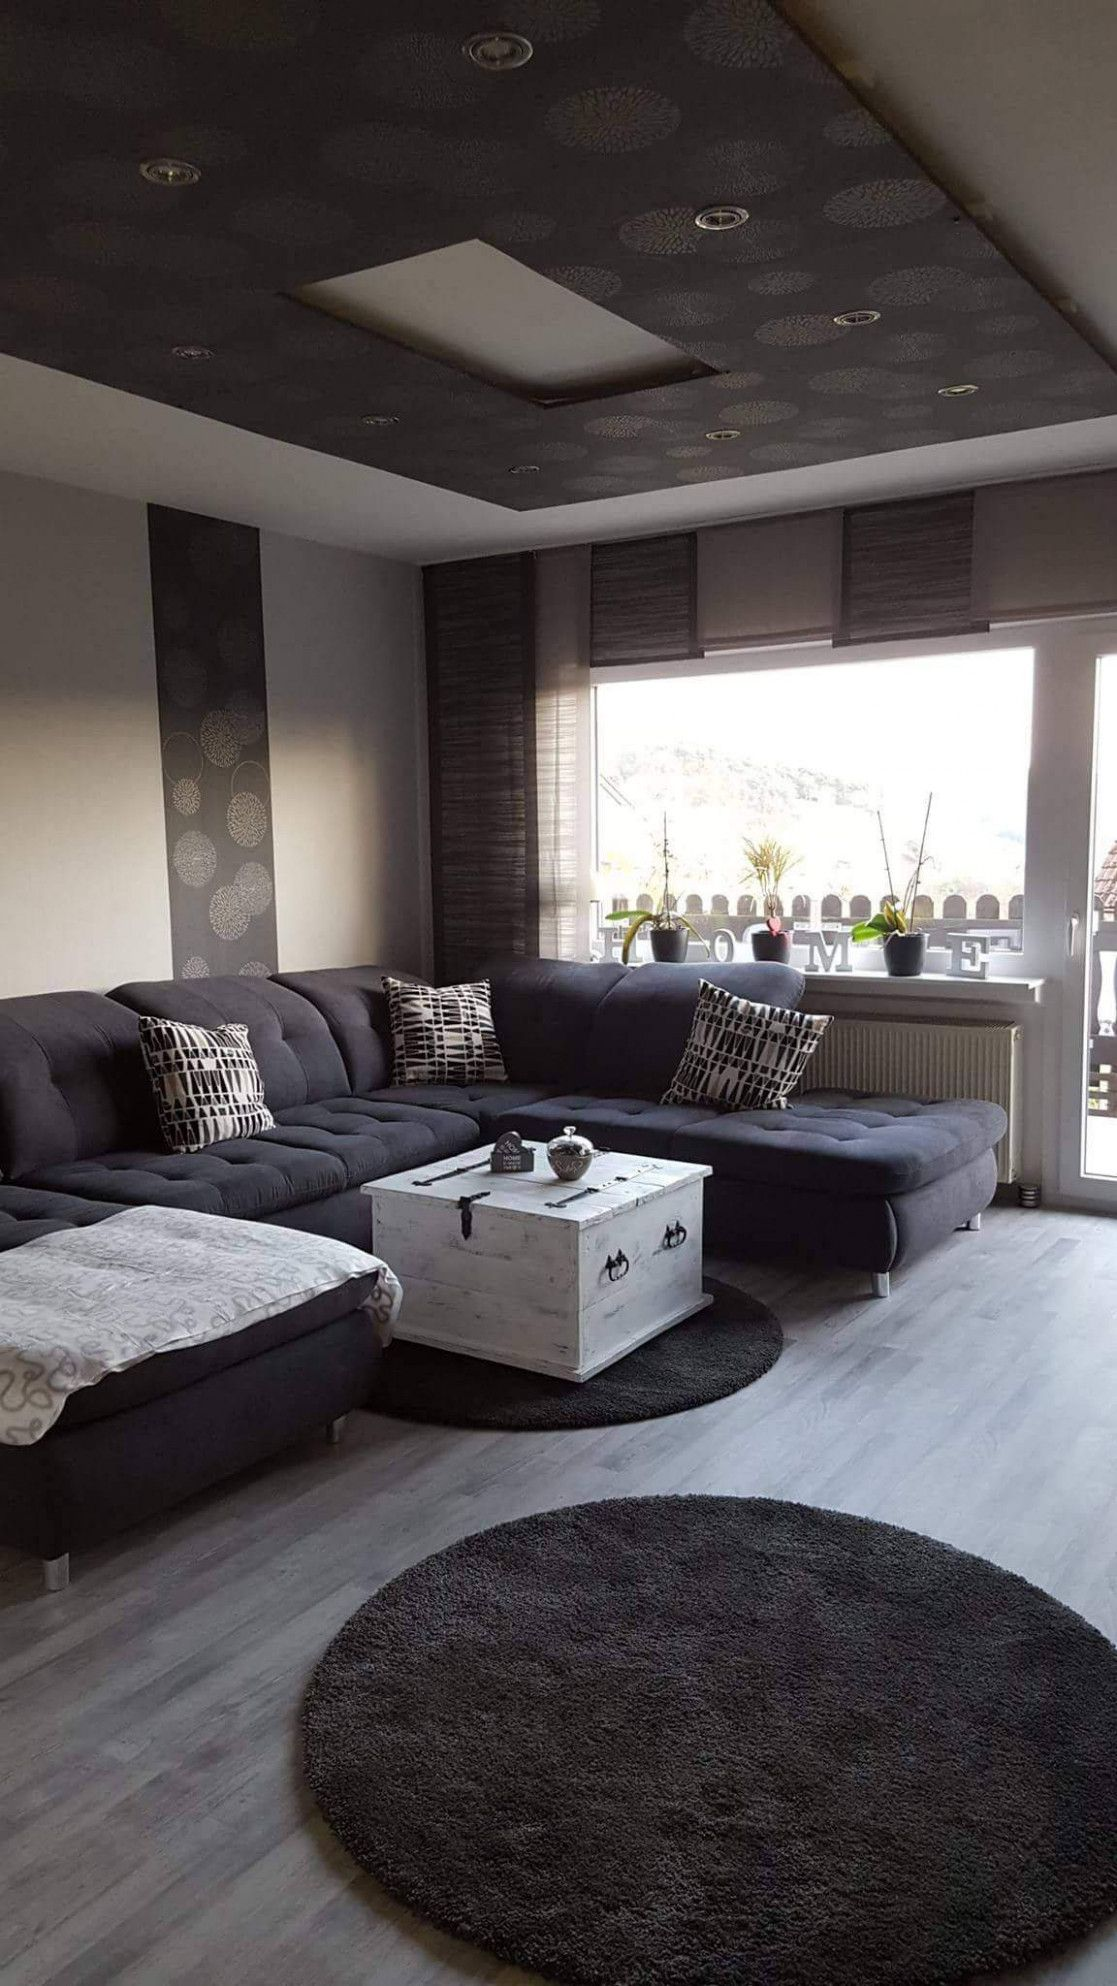 9 Wohnzimmer Ideen Grau di 9